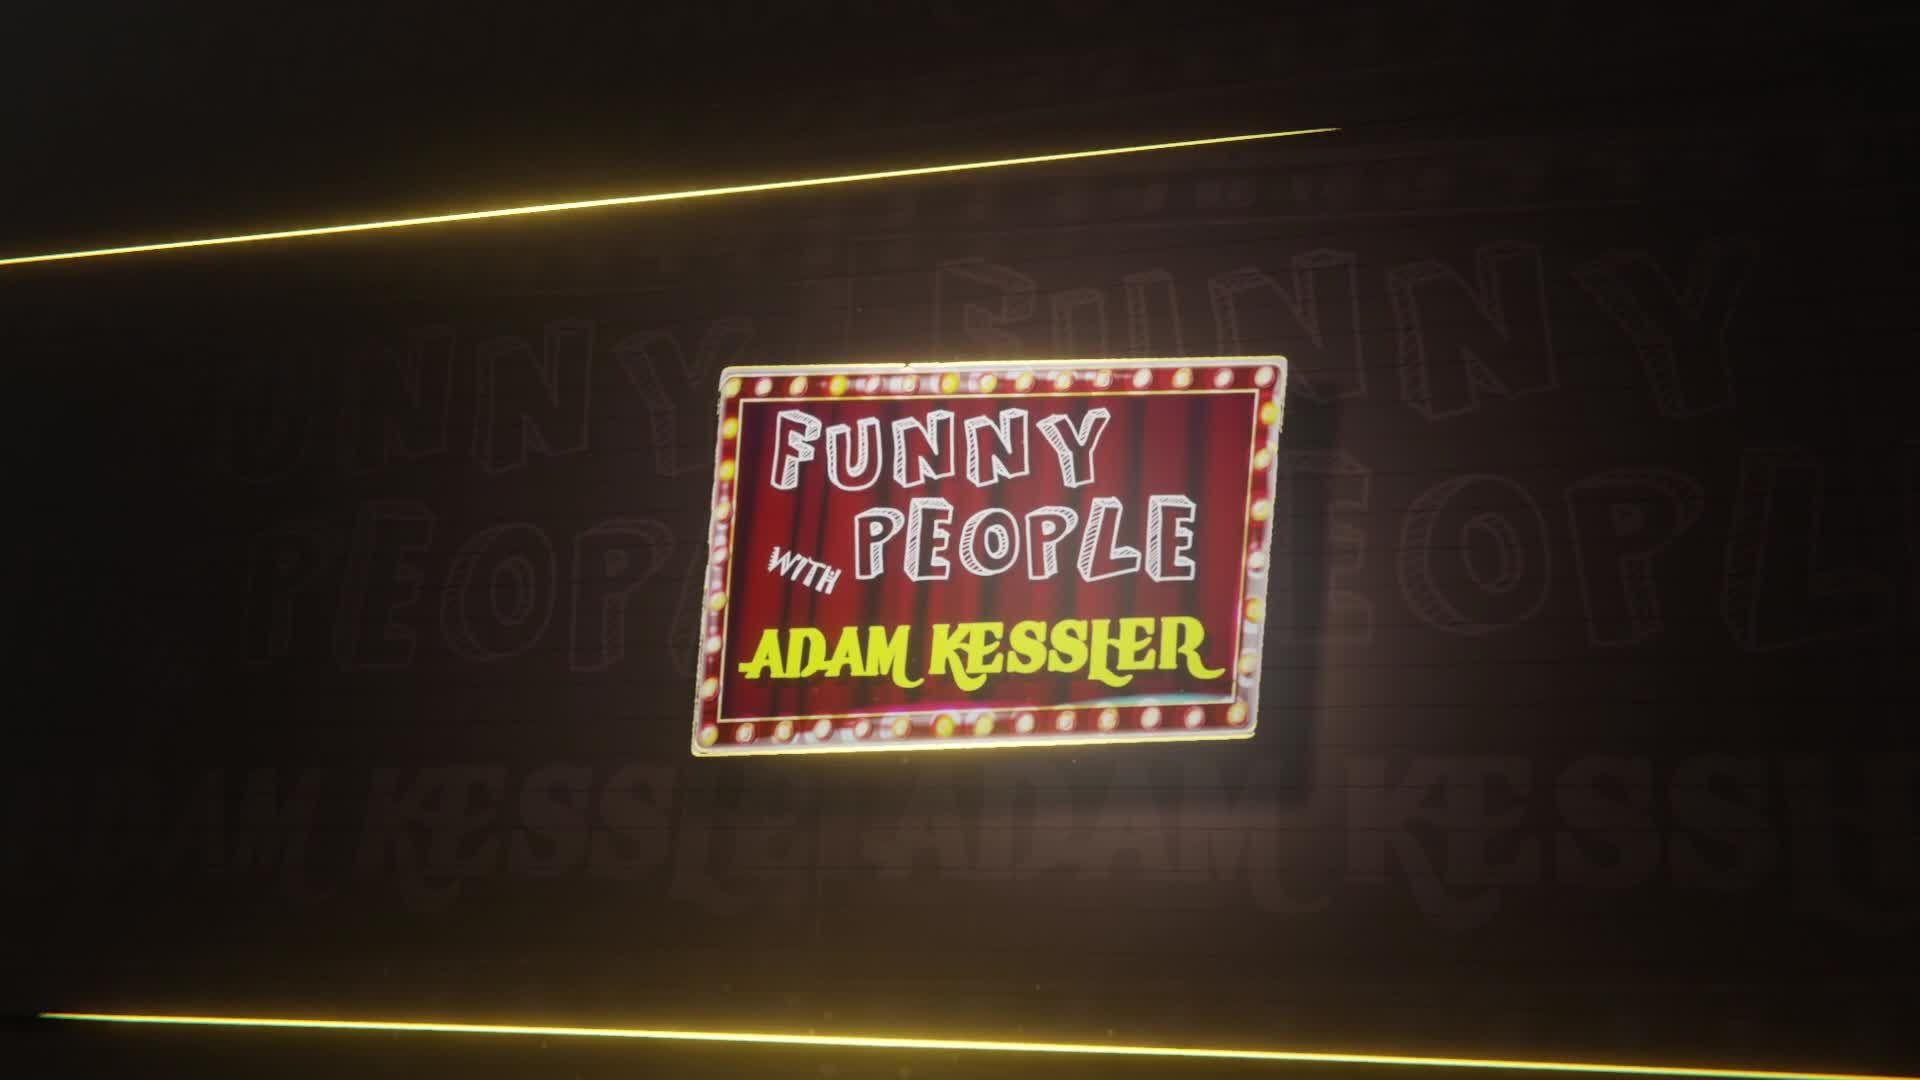 LMAO presents Funny People with Adam Kessler